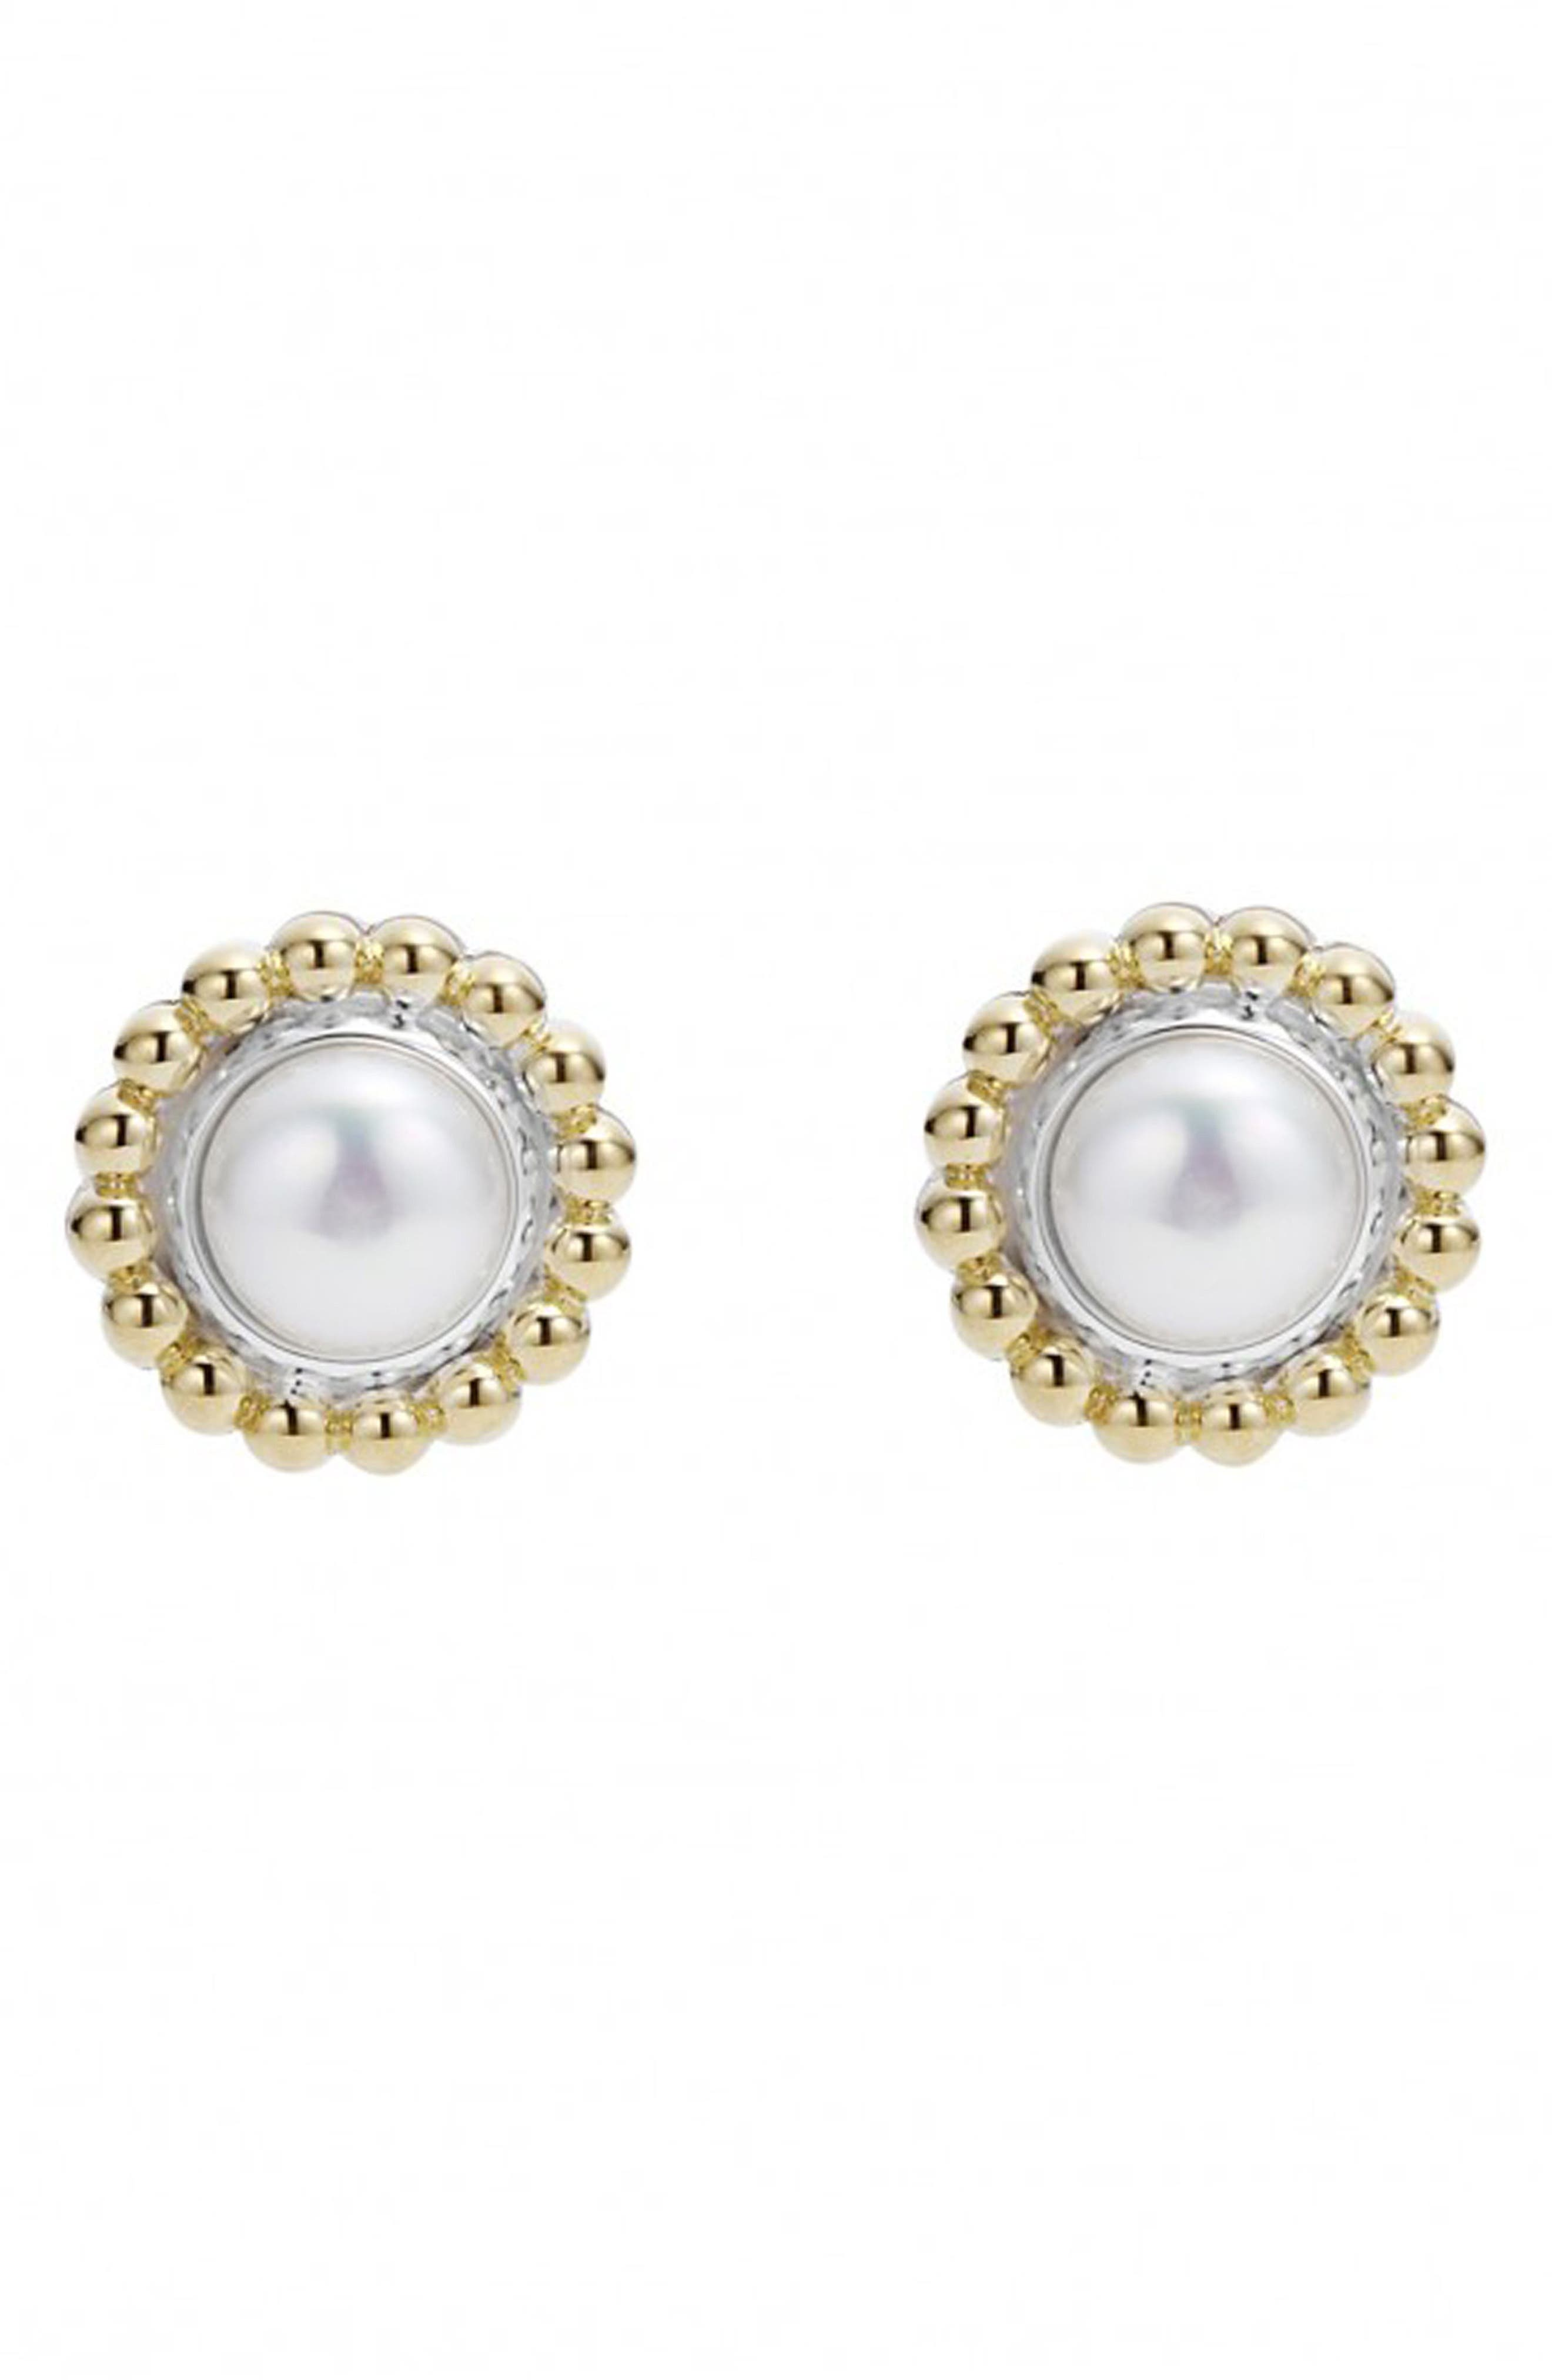 Stone Stud Earrings,                             Alternate thumbnail 2, color,                             PEARL